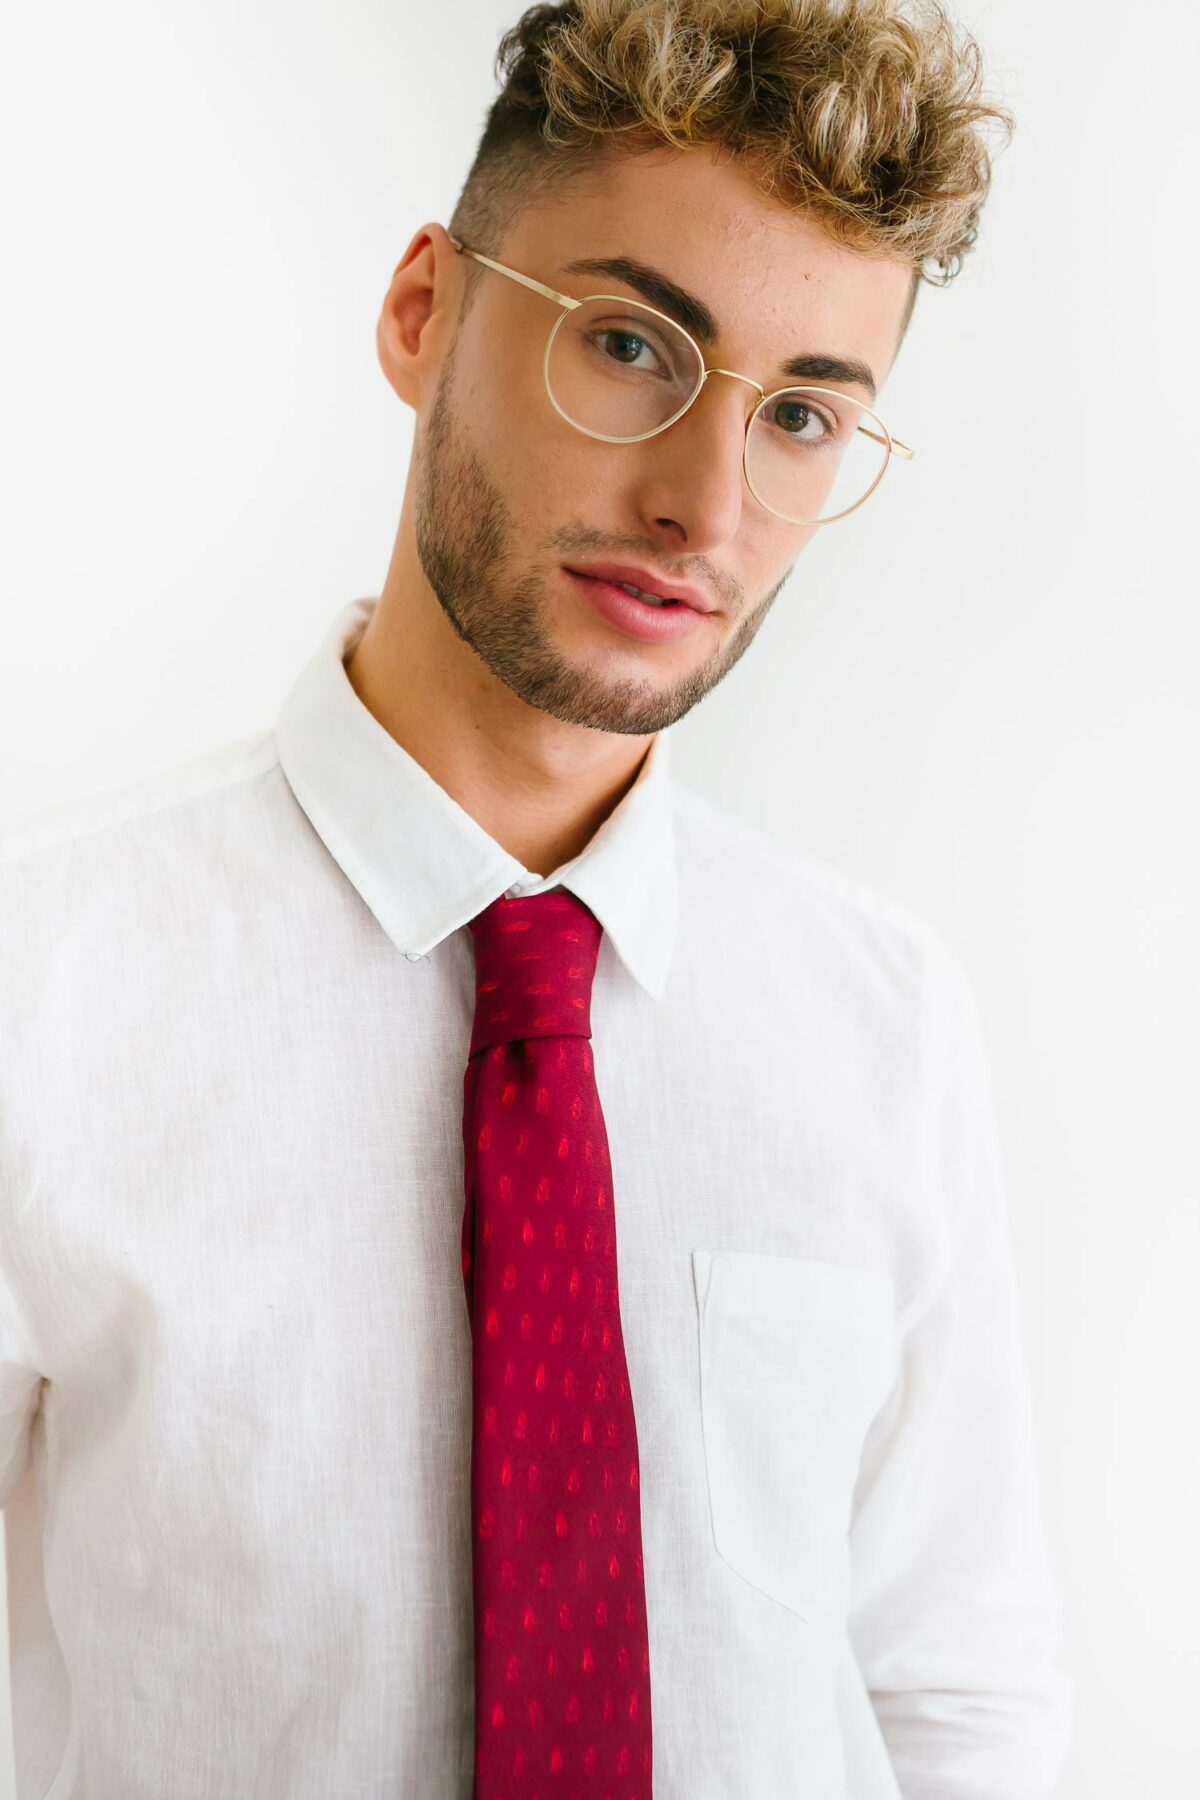 red tie for men